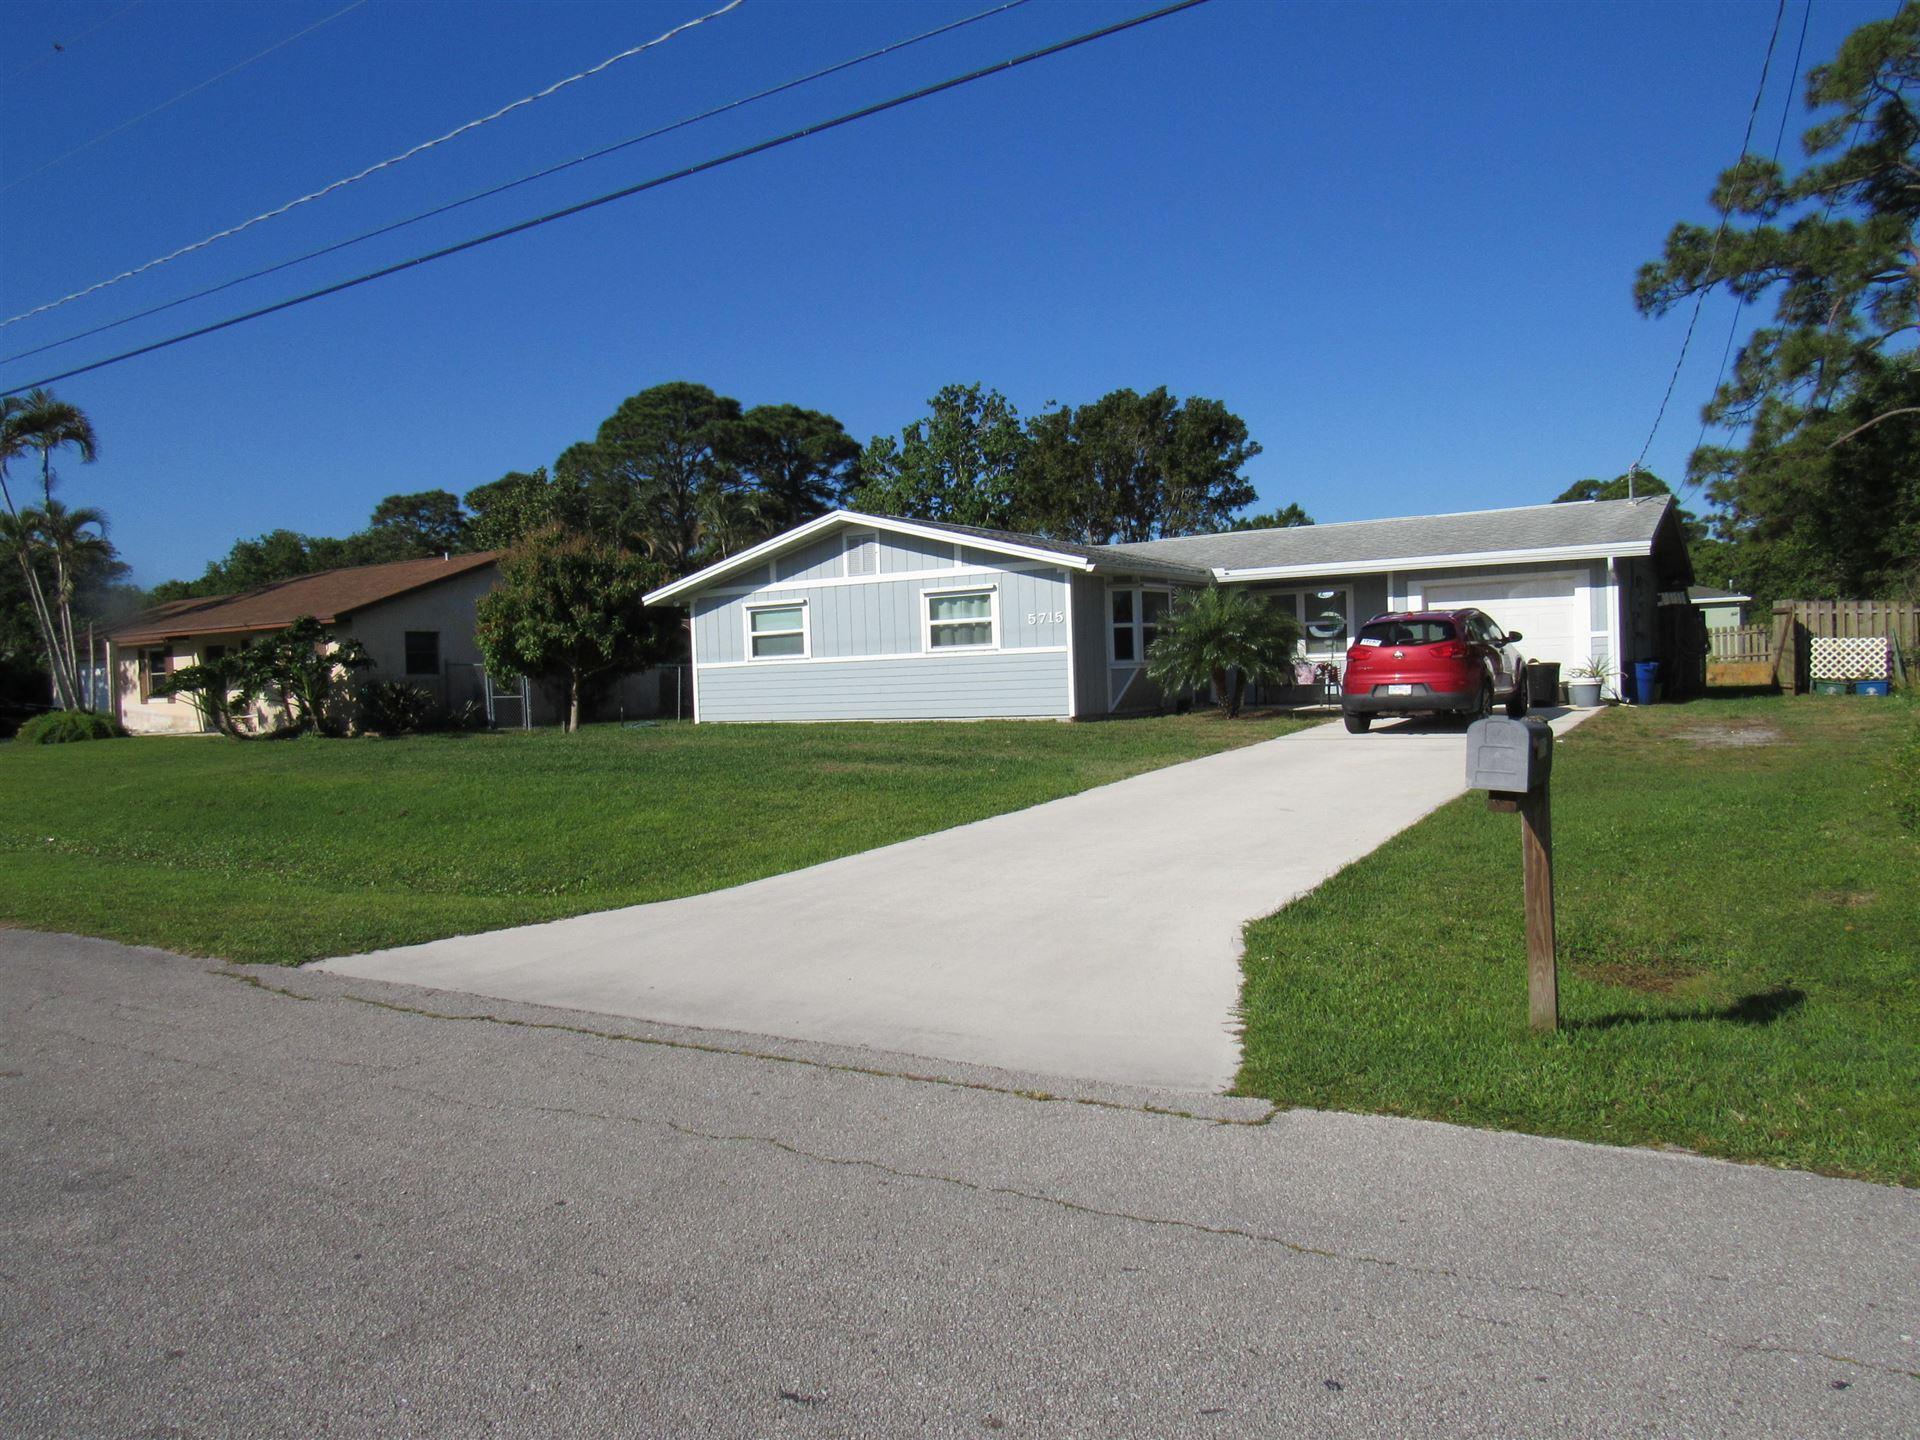 5715 Hickory Drive, Fort Pierce, FL 34982 - #: RX-10700581